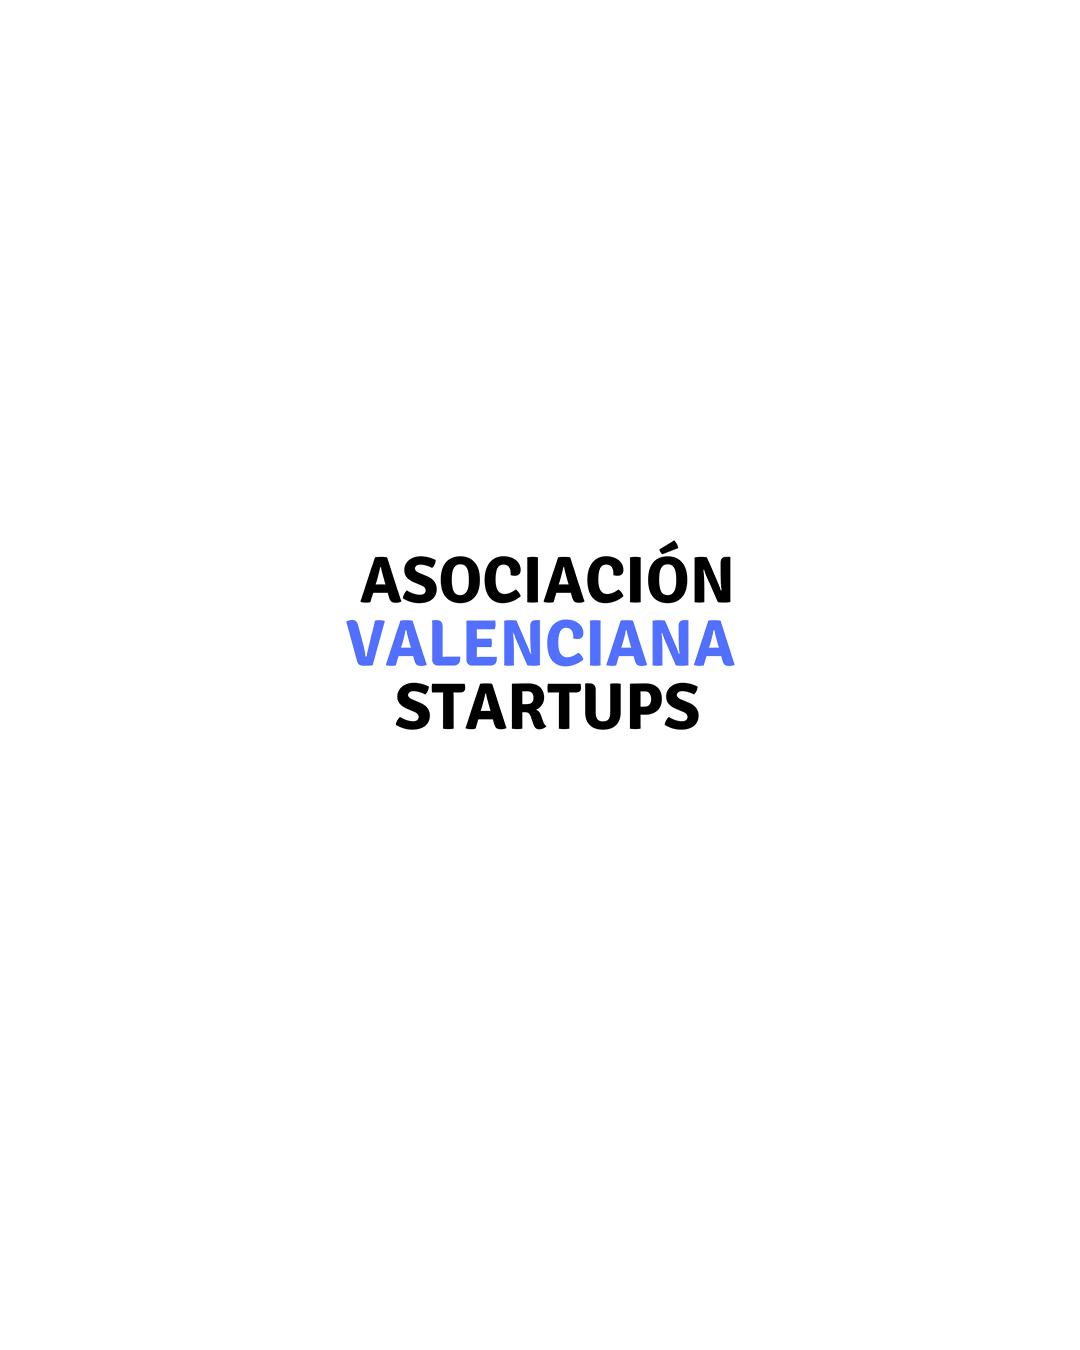 XAsociacion Valenciana Startups